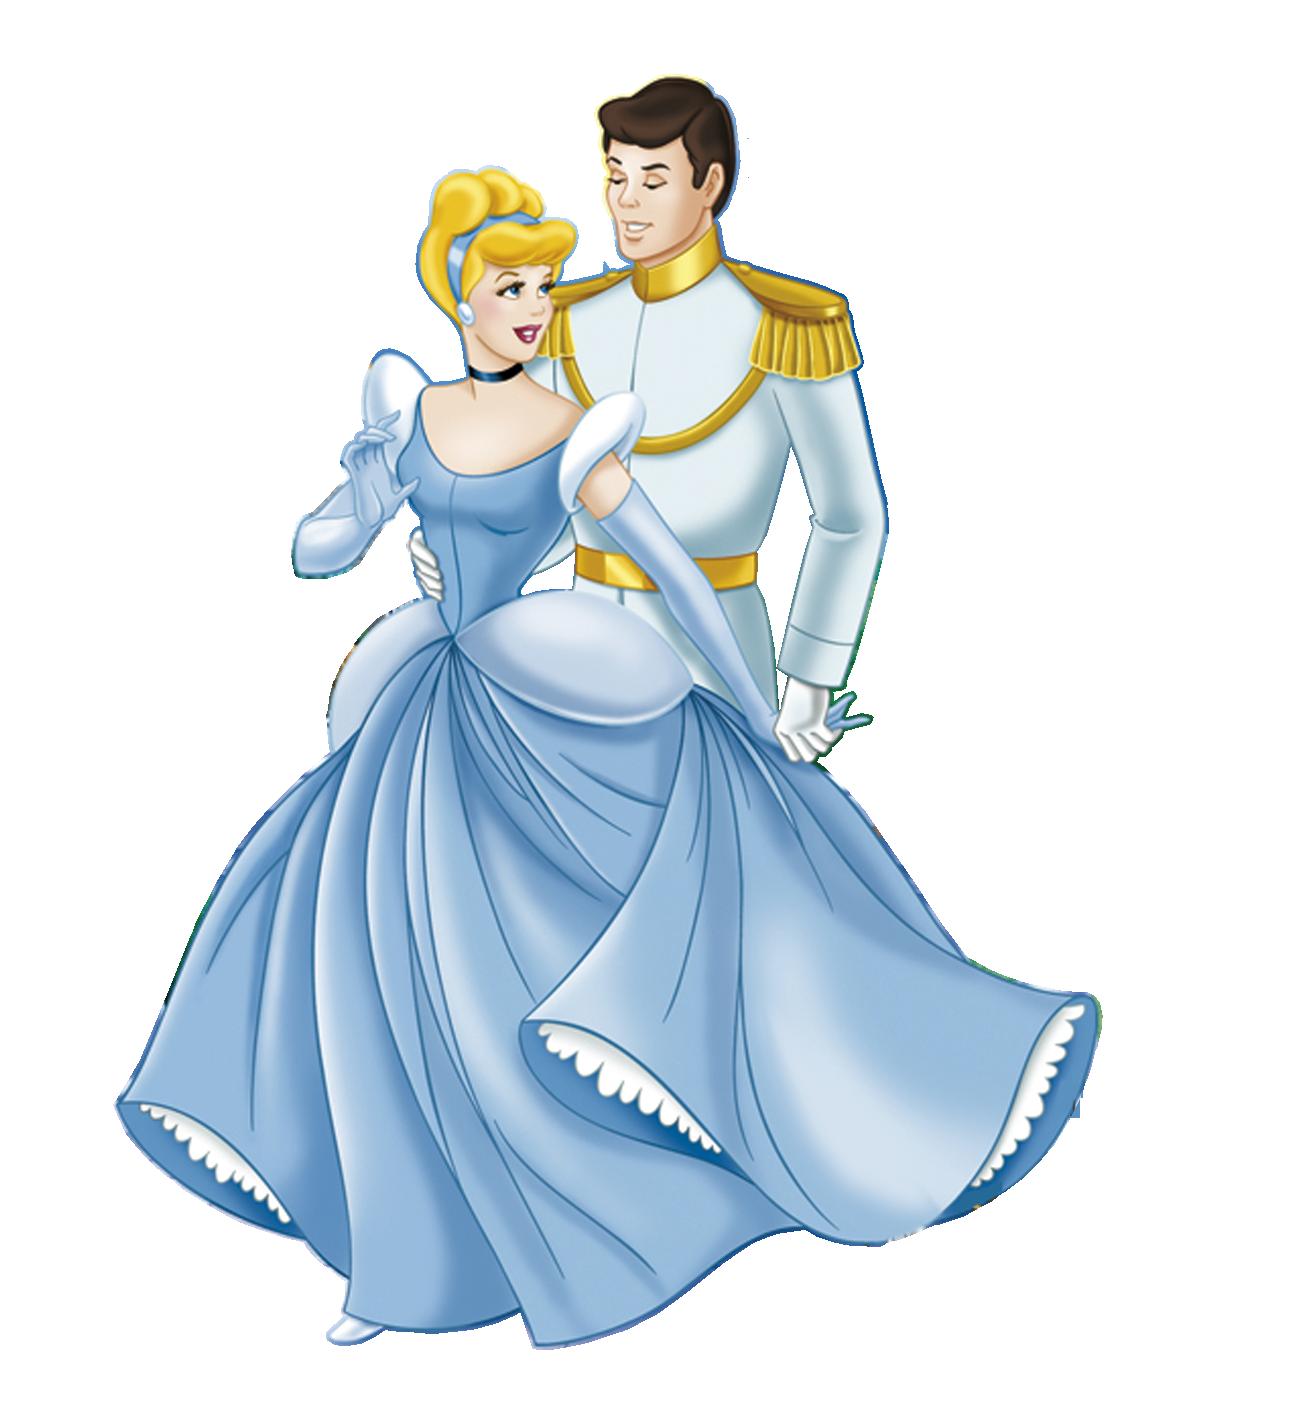 Принцесса принц дисней картинки